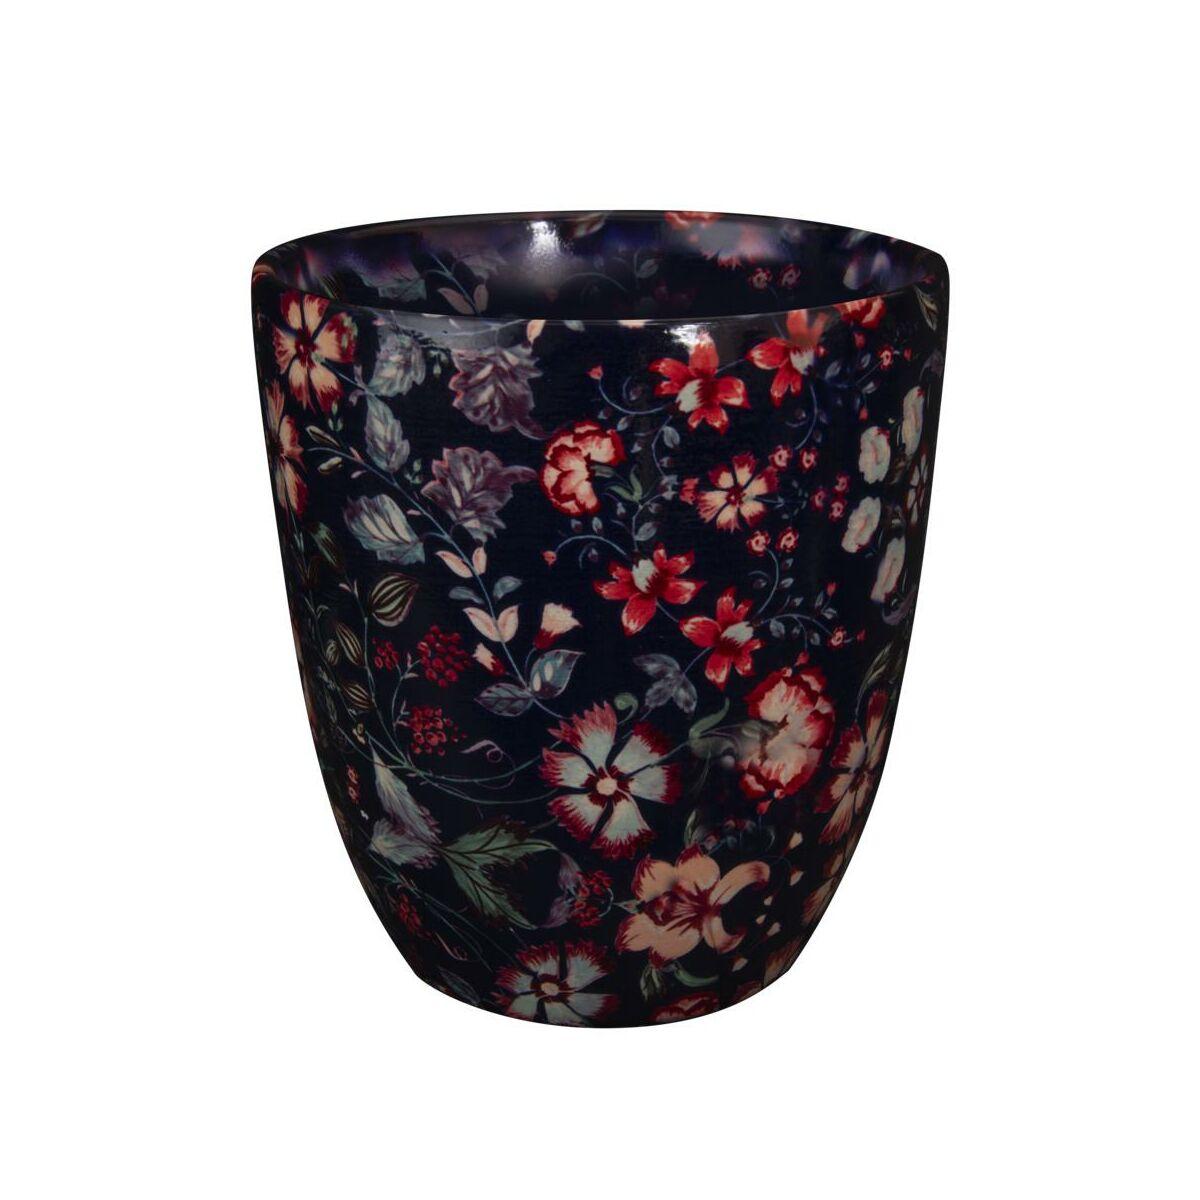 Osłonka Ceramiczna 16 Cm Granatowa Nova Eko Ceramika